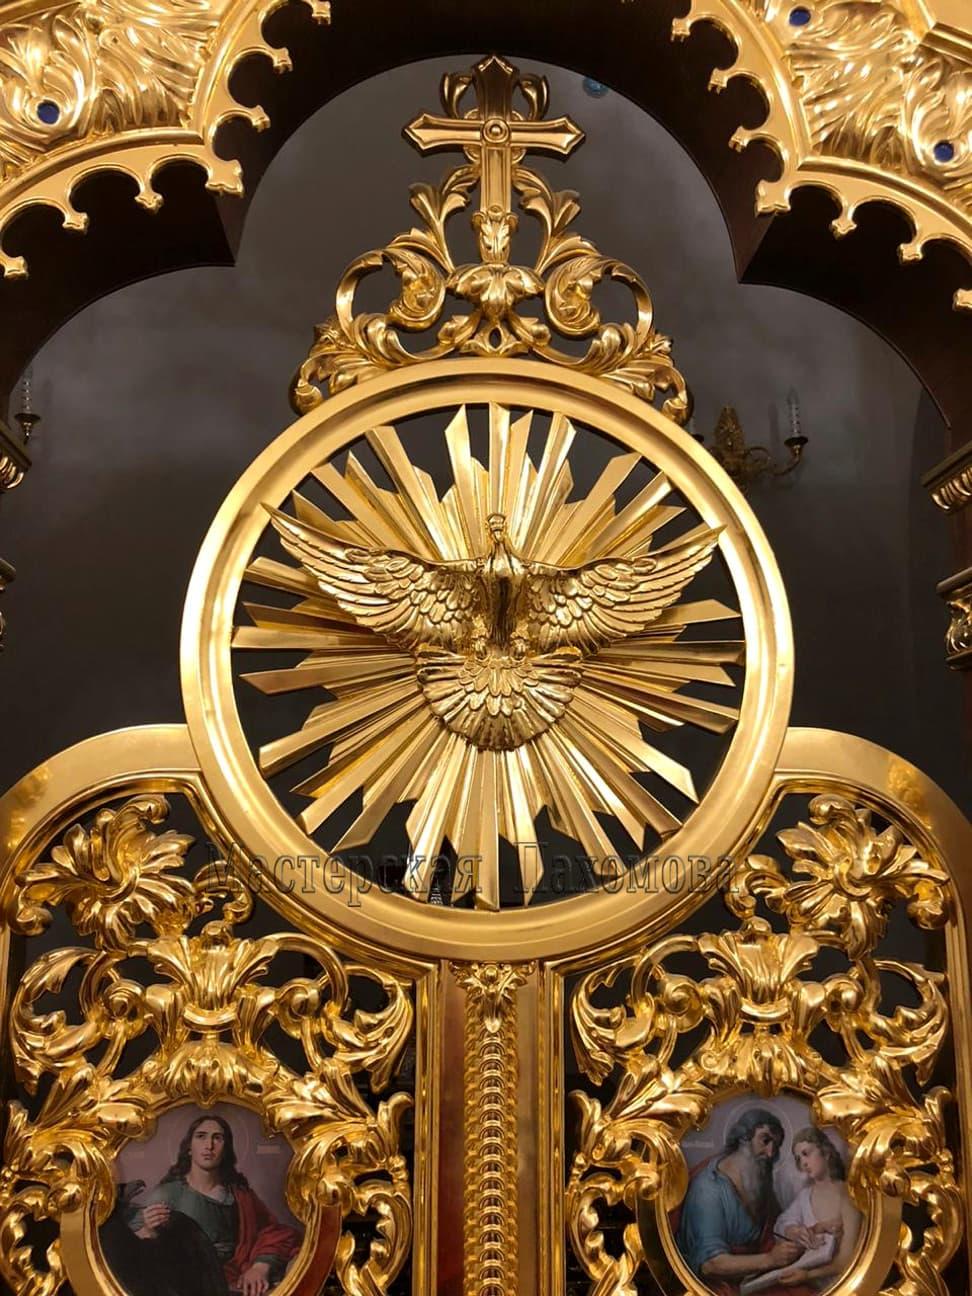 Царские врата иконостаса. Голубь над царскими вратами - ручная резьба по дереву, позолота